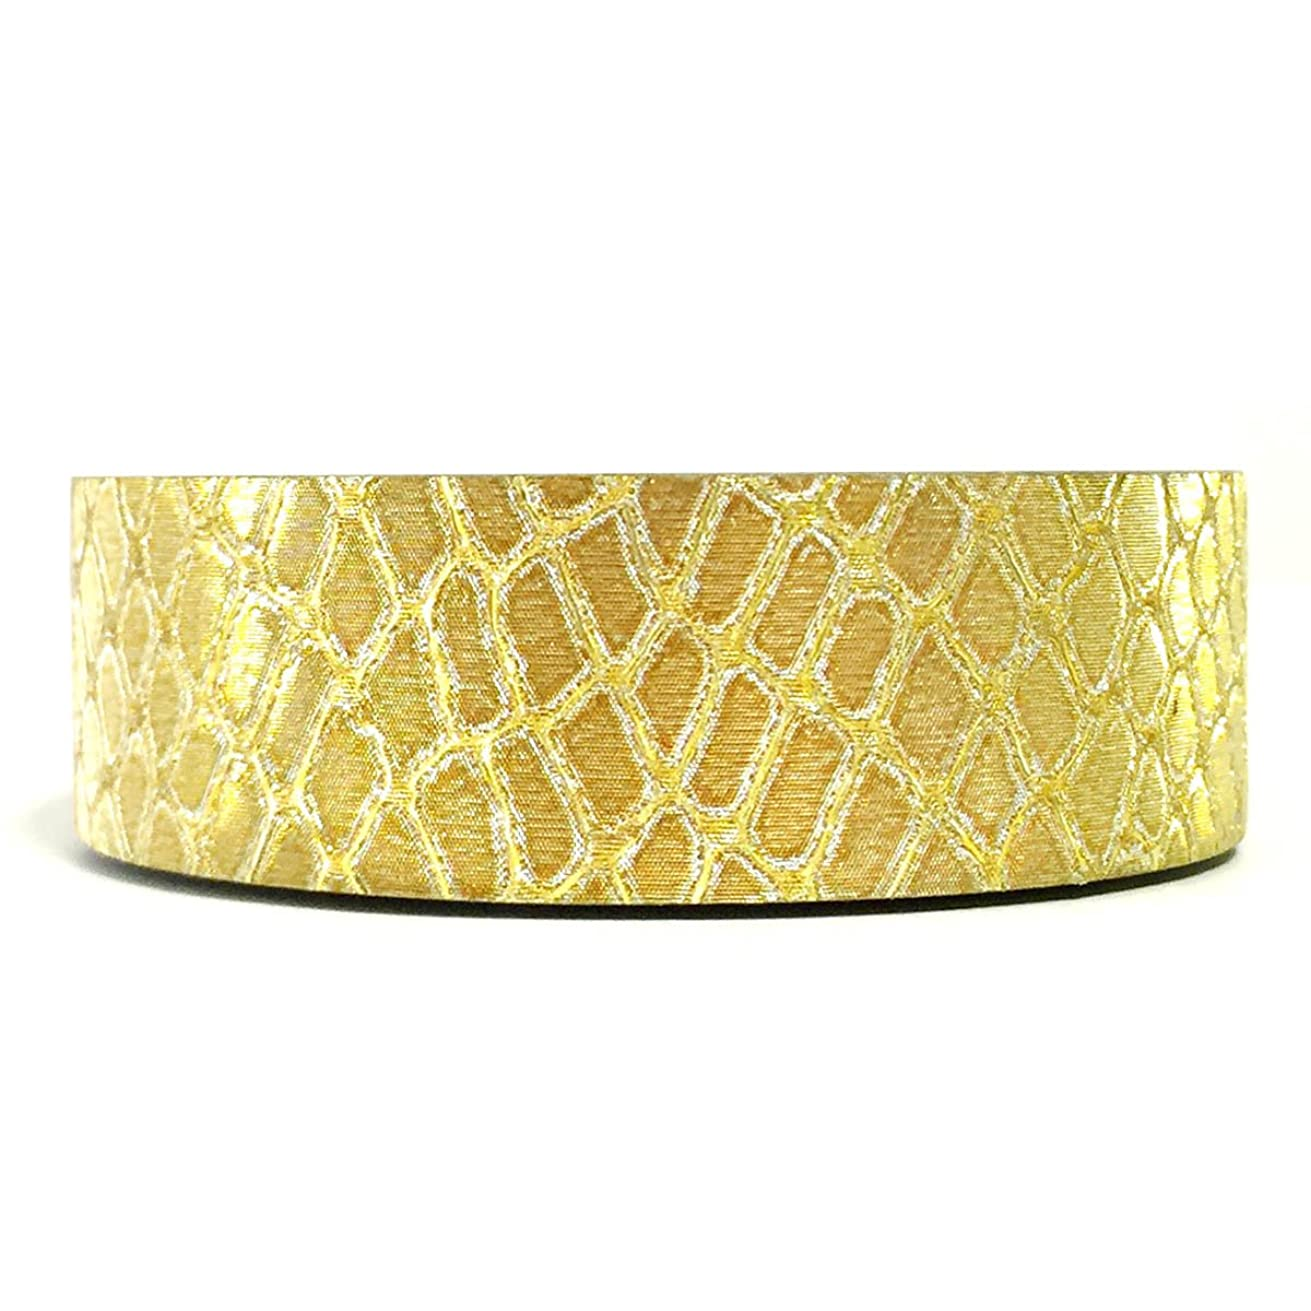 Allydrew Decorative Washi Masking Tape, Shiny Gold Snake Print